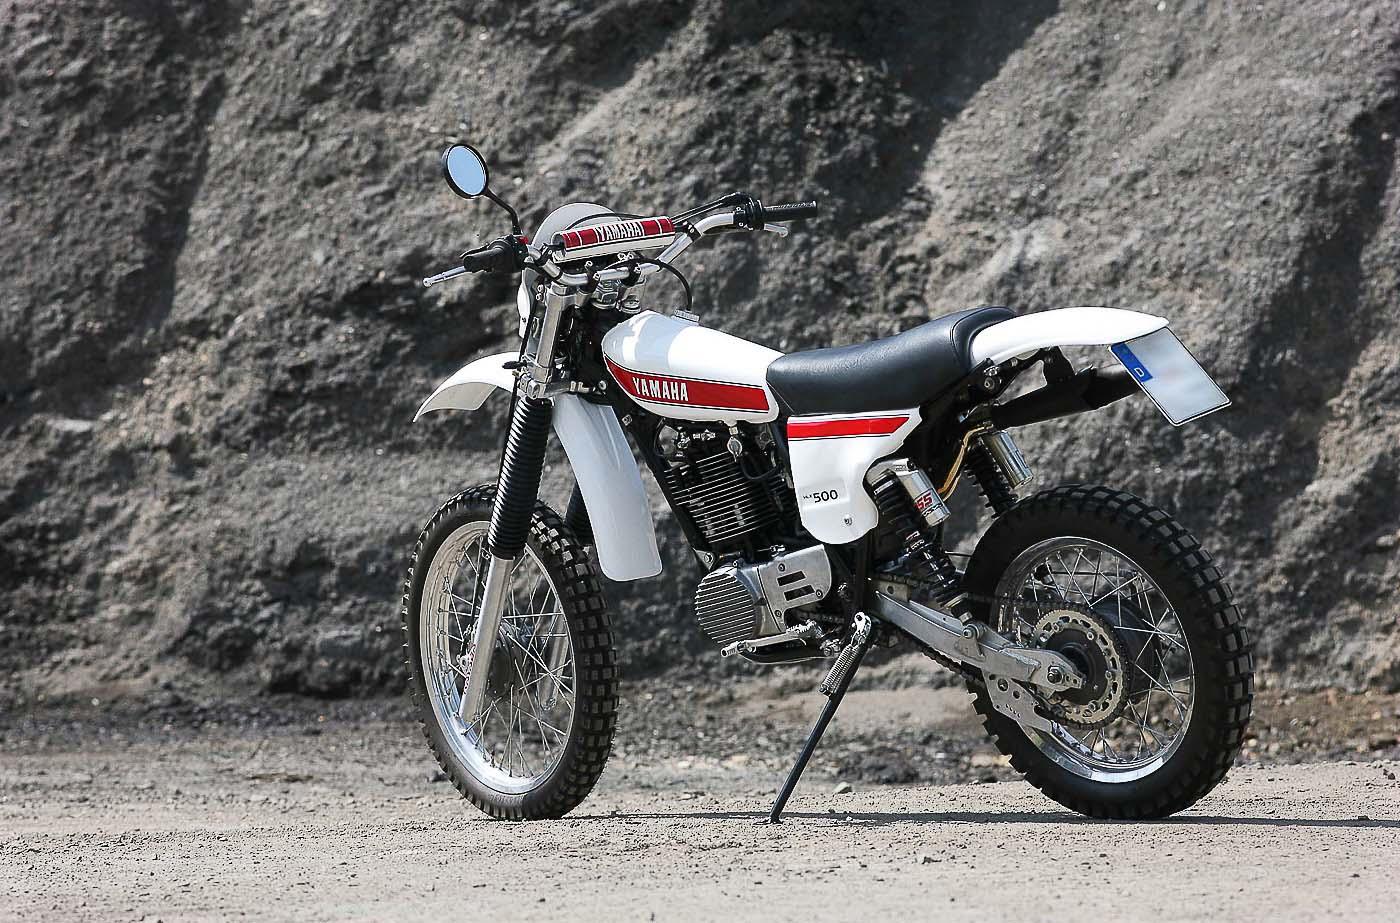 YAMAHA HL 500 (1977 - 1979)